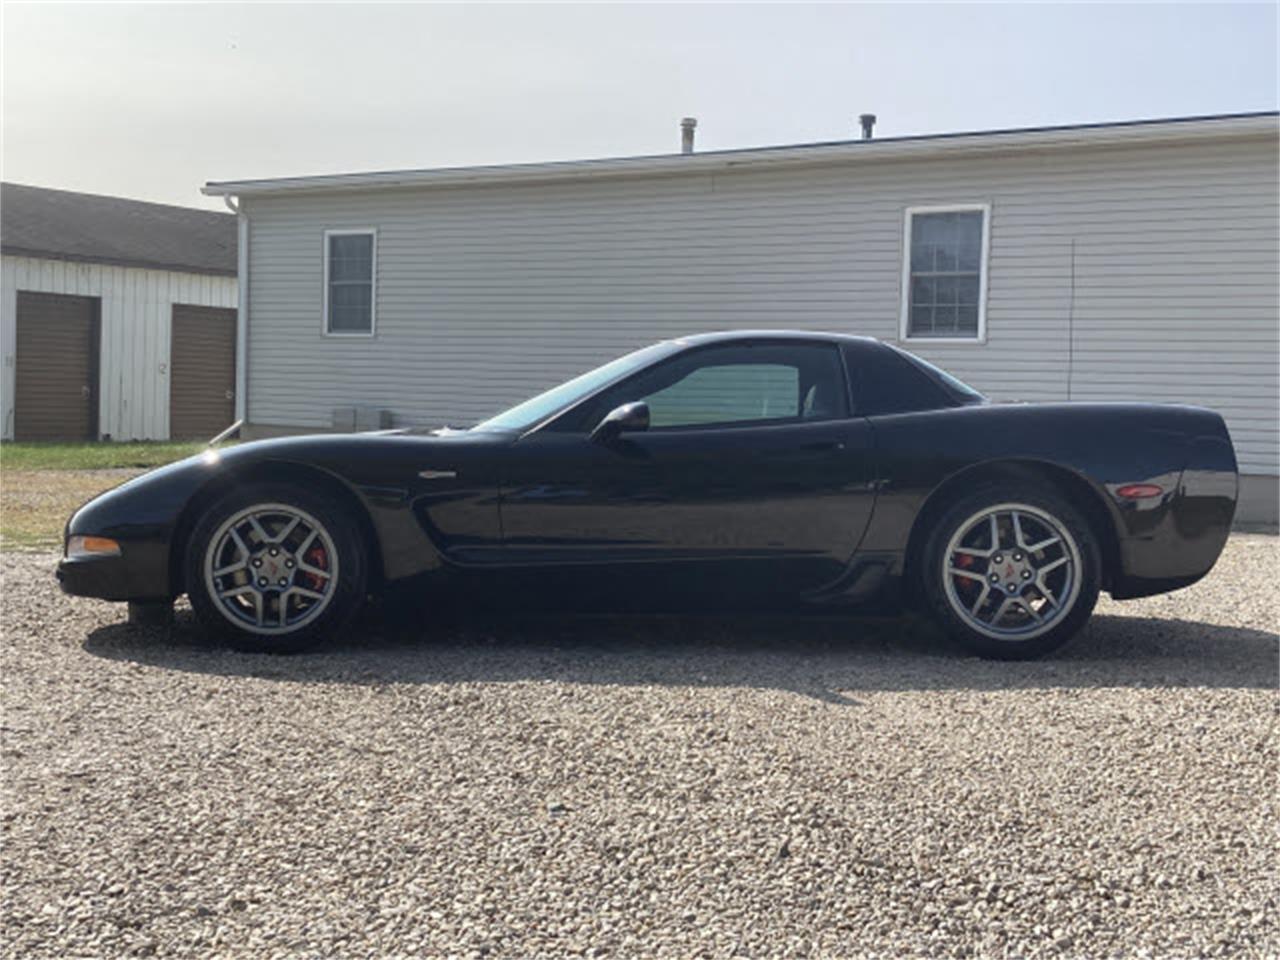 2004 Chevrolet Corvette (CC-1414592) for sale in Marysville, Ohio